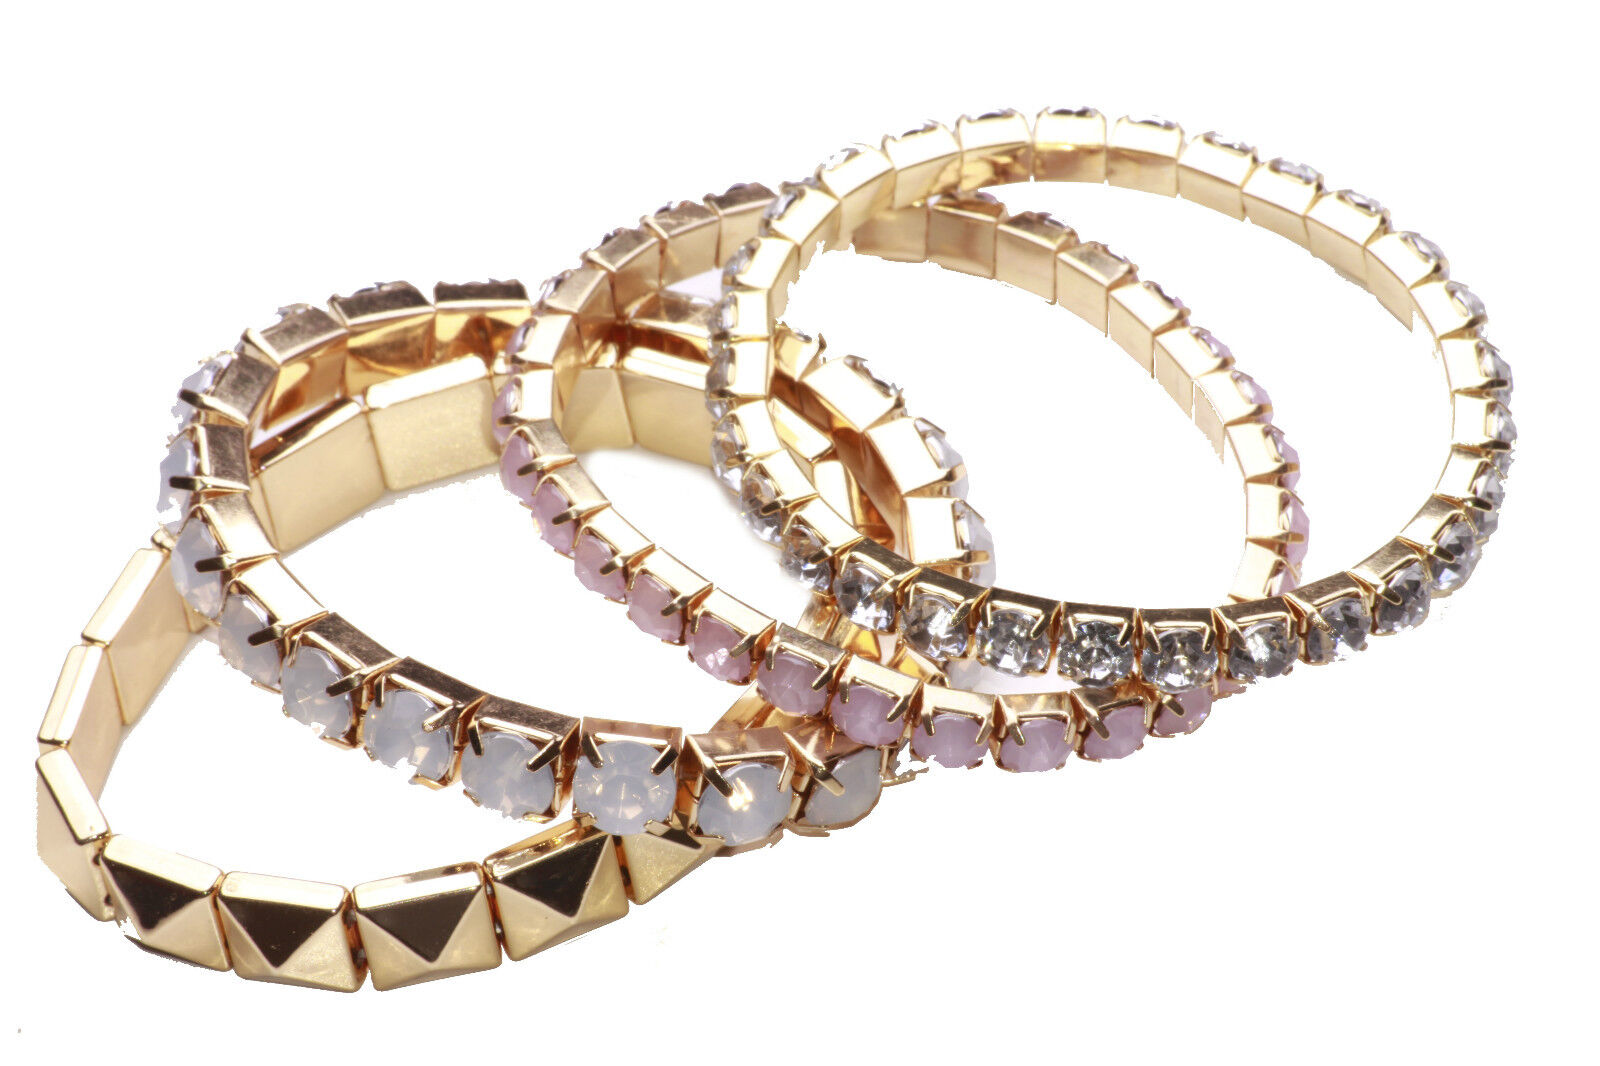 6ff99d3676c GLAM SET OF 4 STRETCHY GOLD SPARKLY BRACELETS PINK/WHITE RHINESTONES (NS31)